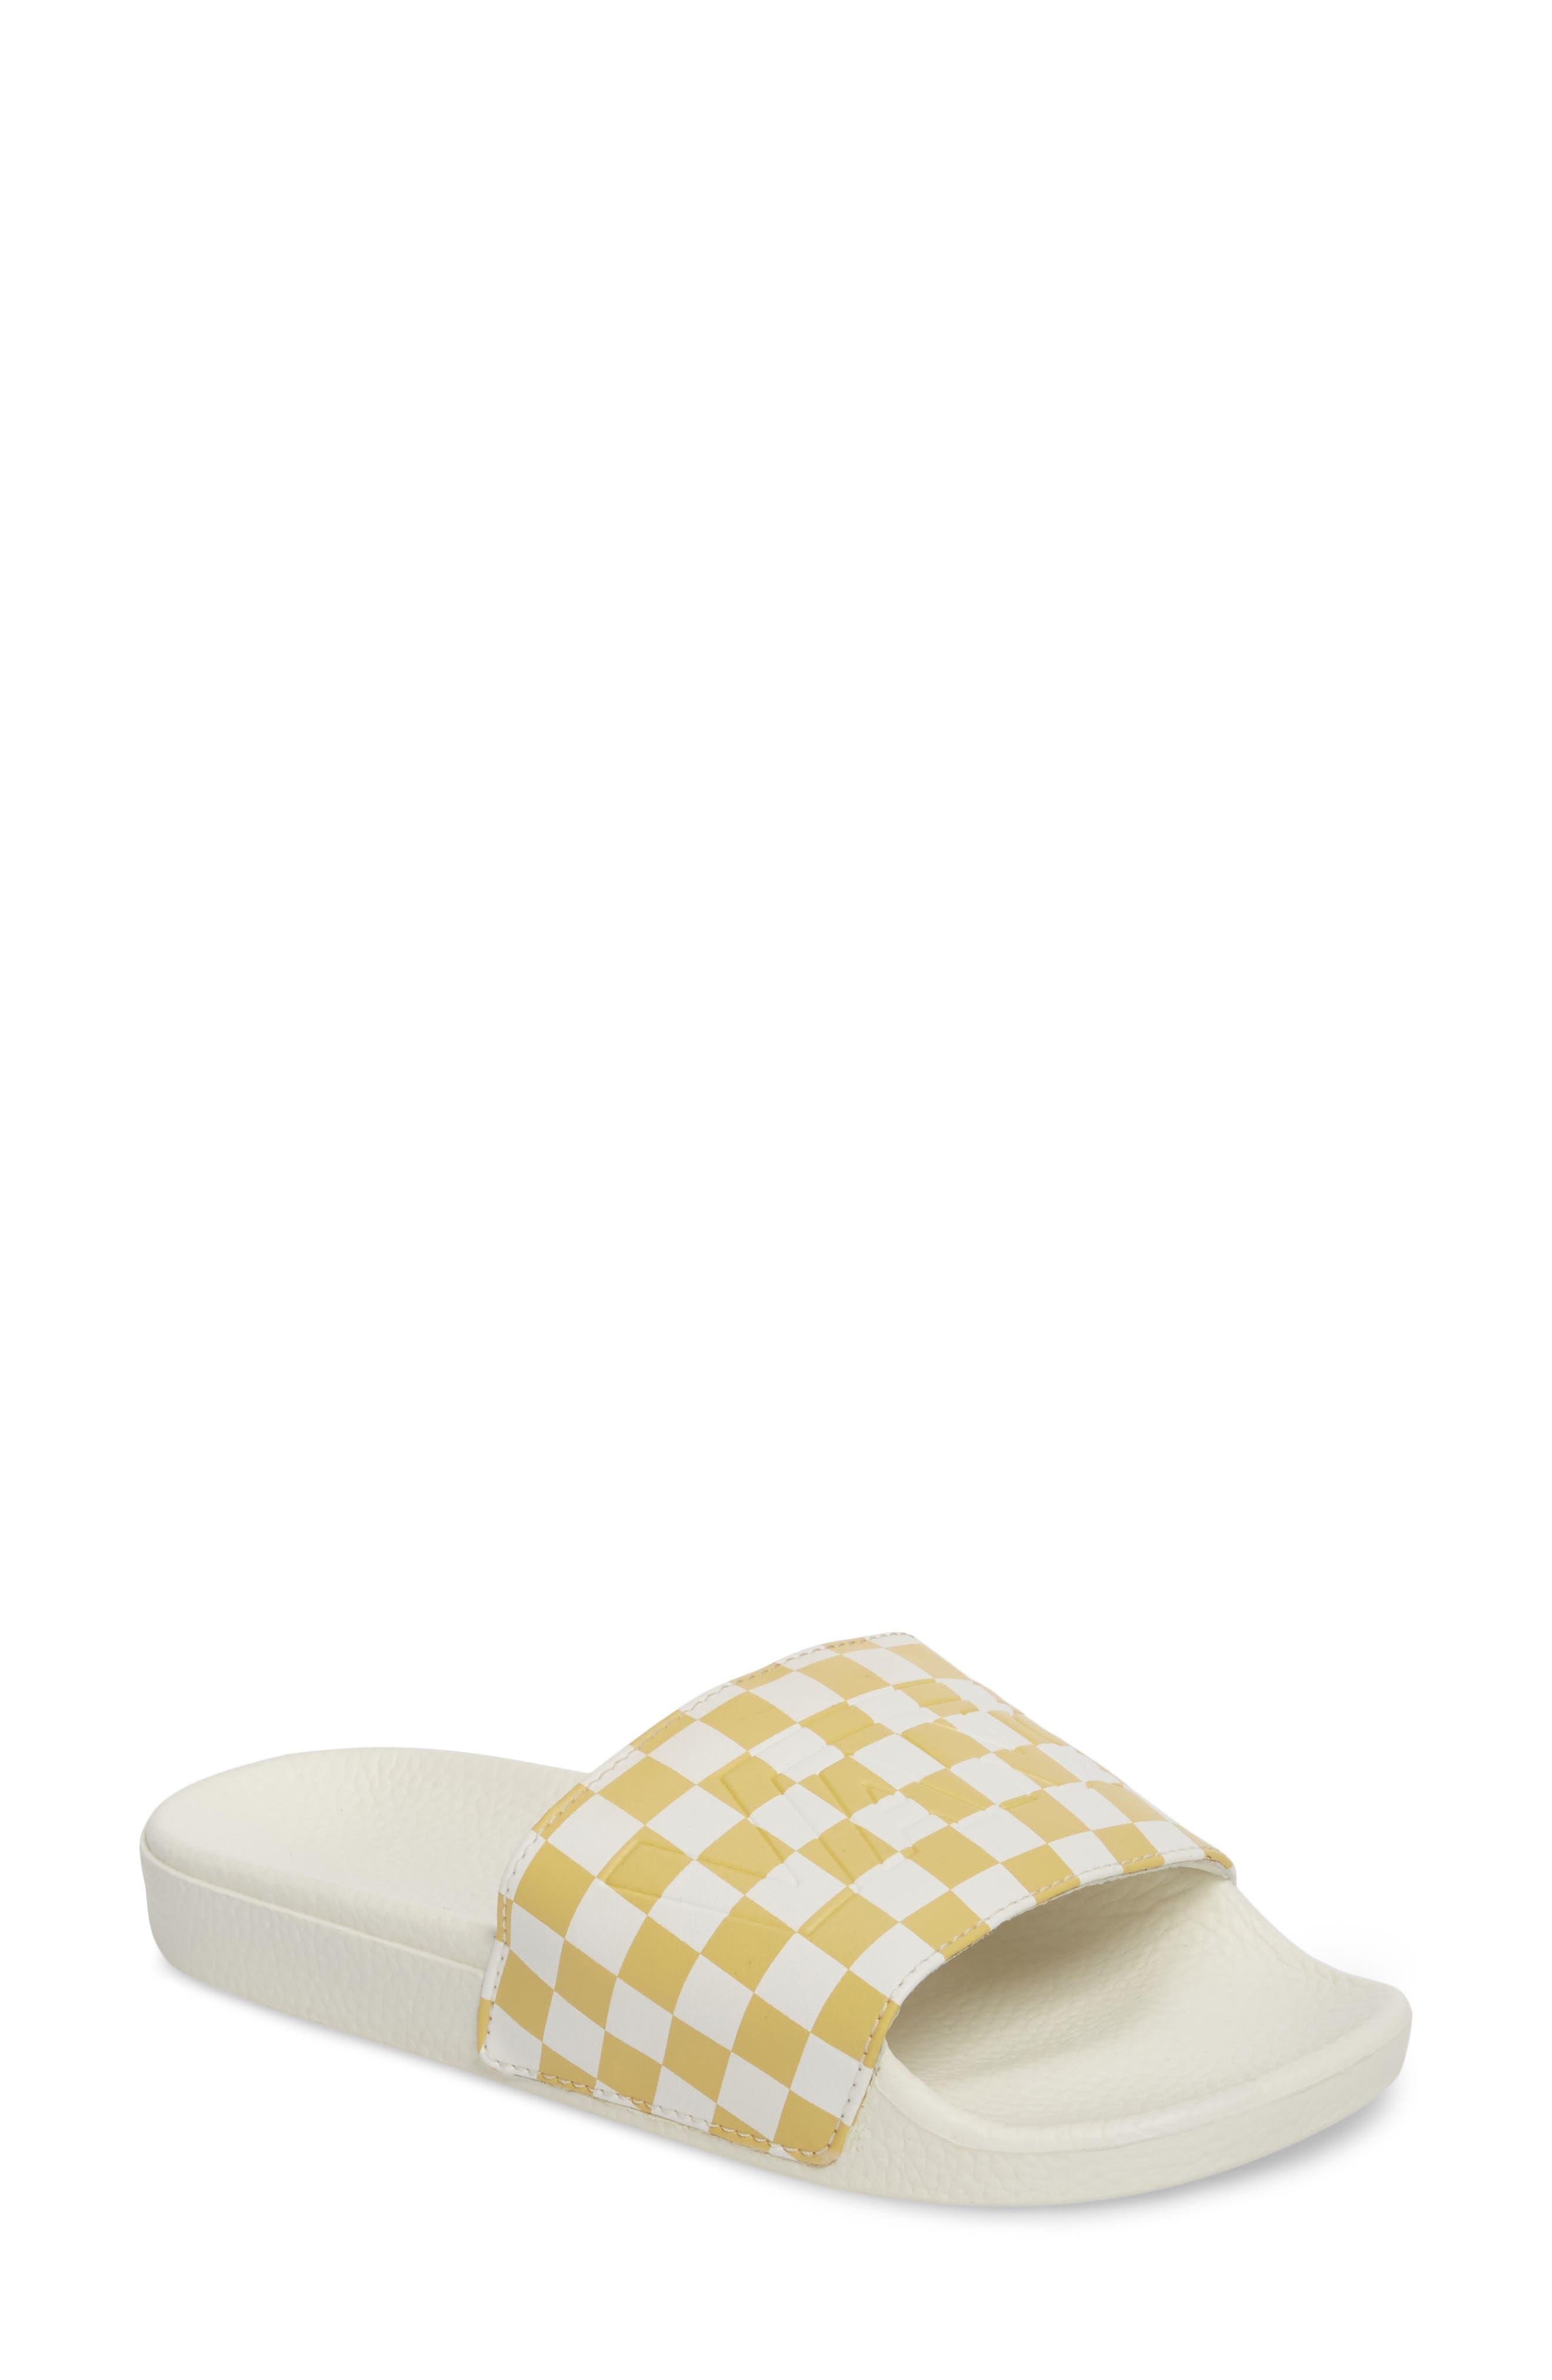 38d74ecffb2 VANS Slide-On Sandal